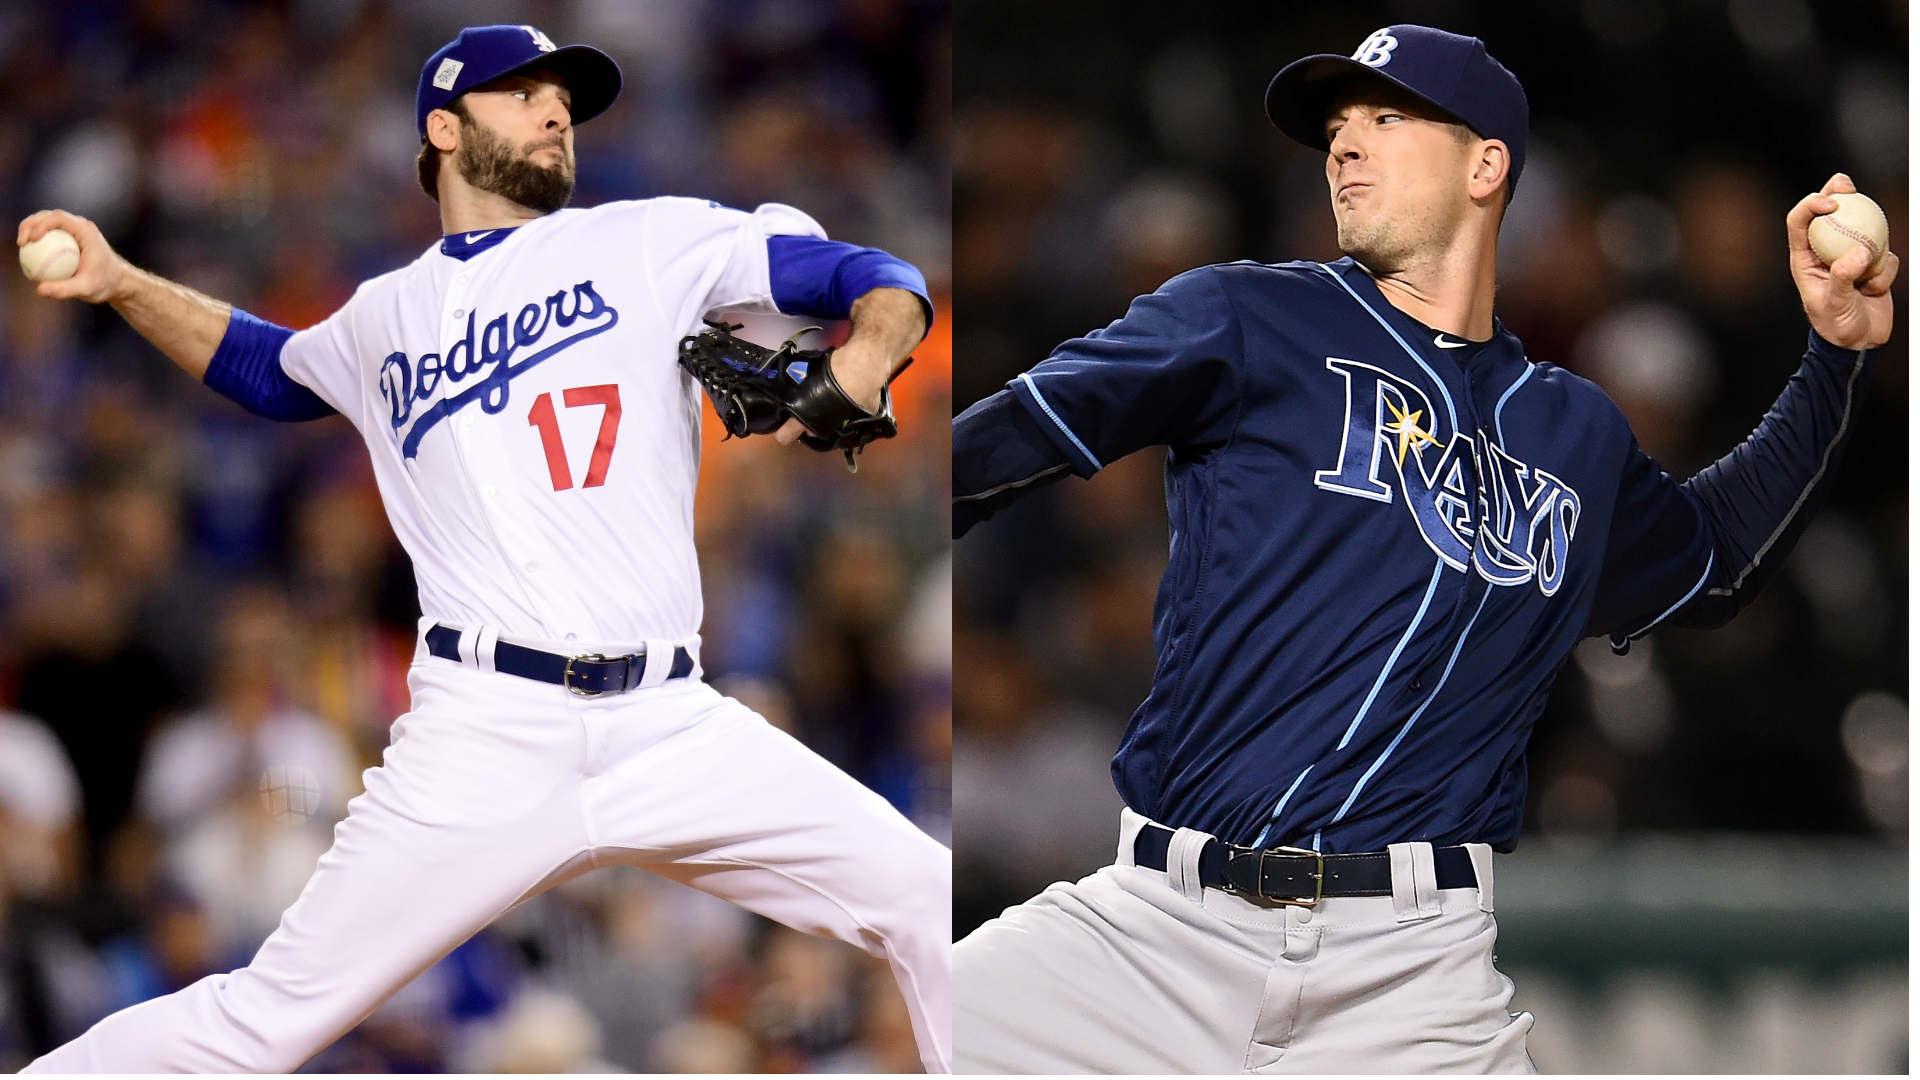 Cubs add pitchers Drew Smyly, Brandon Morrow